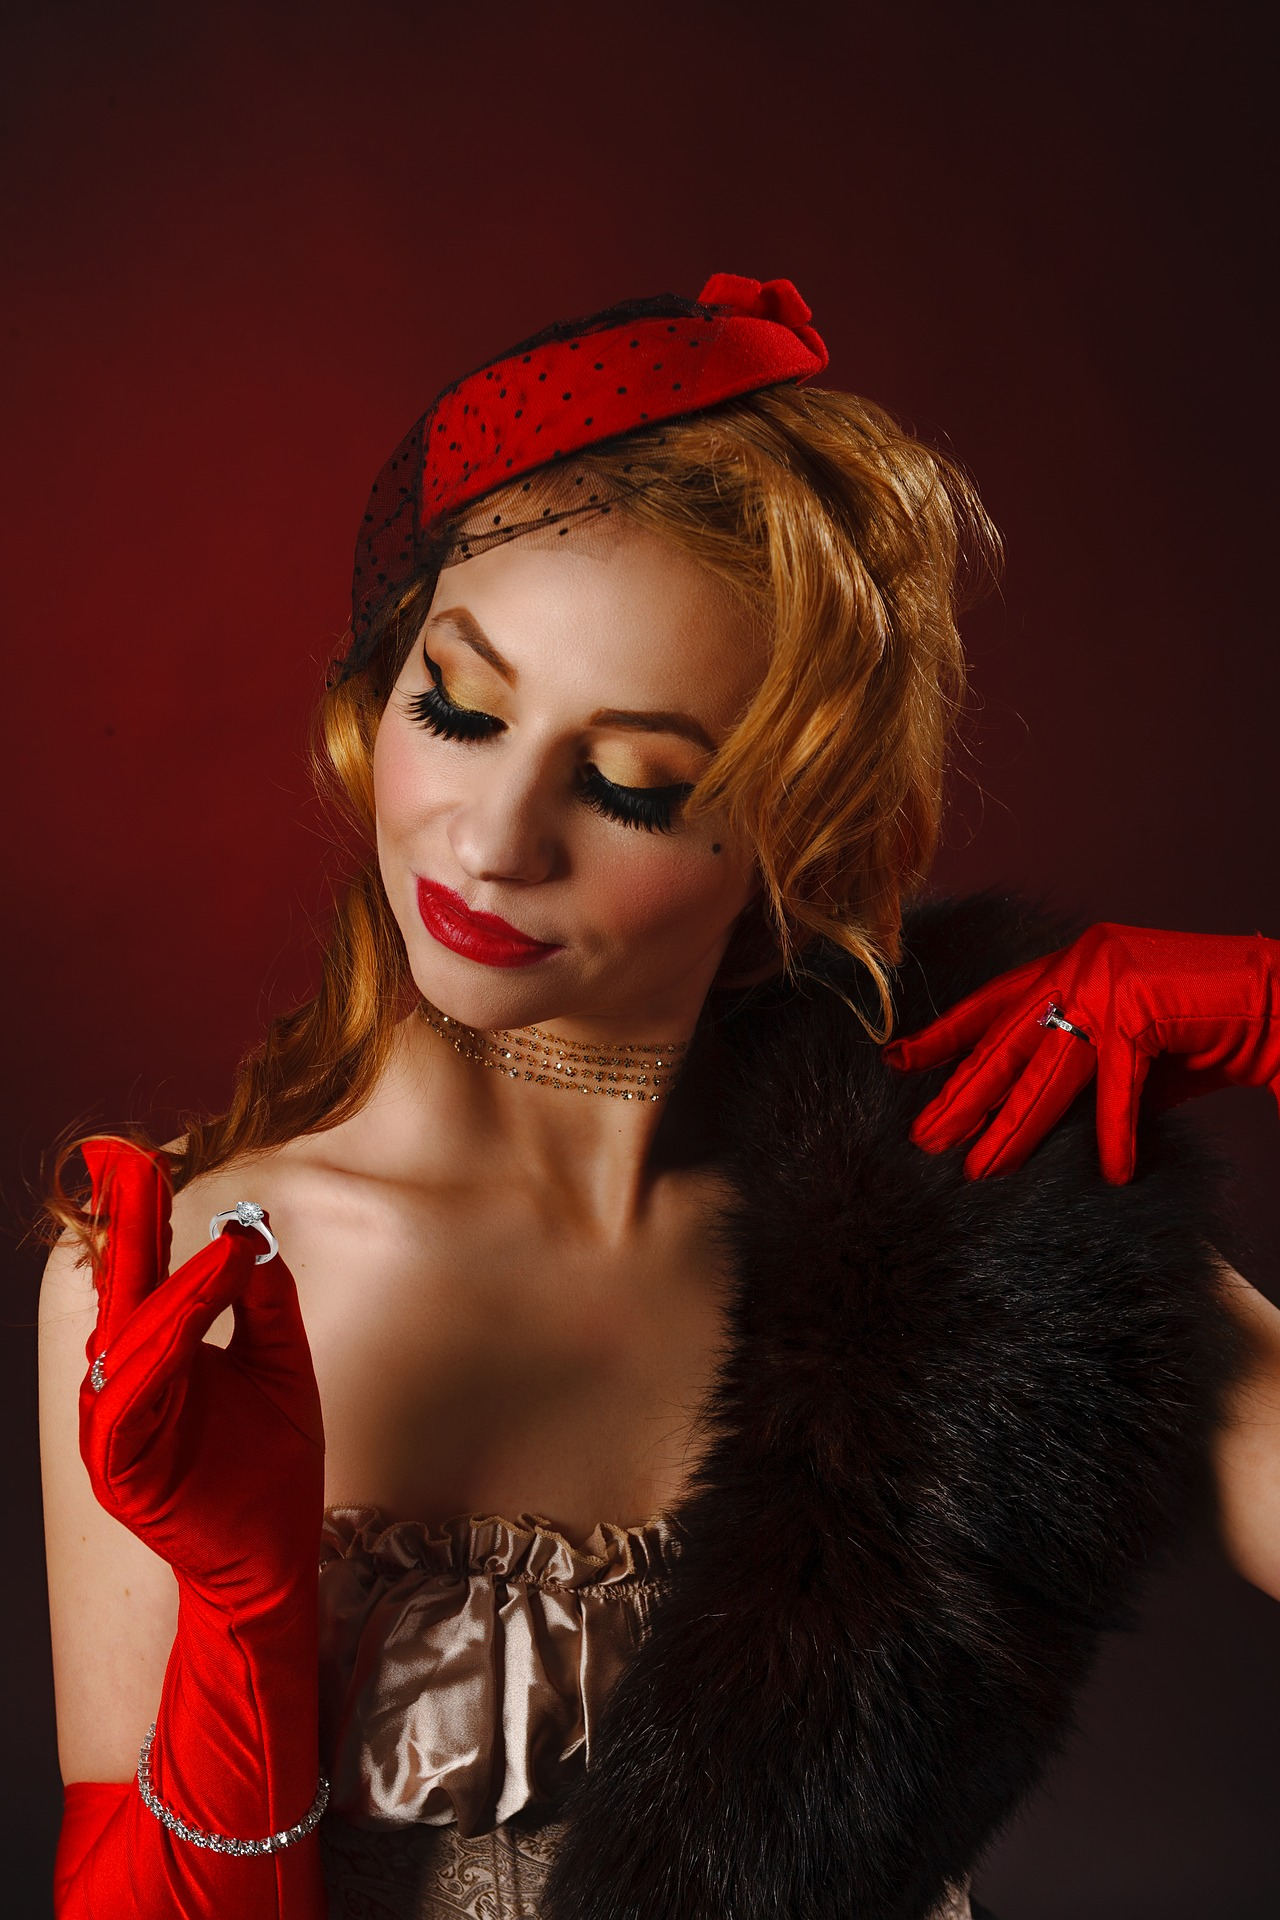 burlesque-4064903_1920